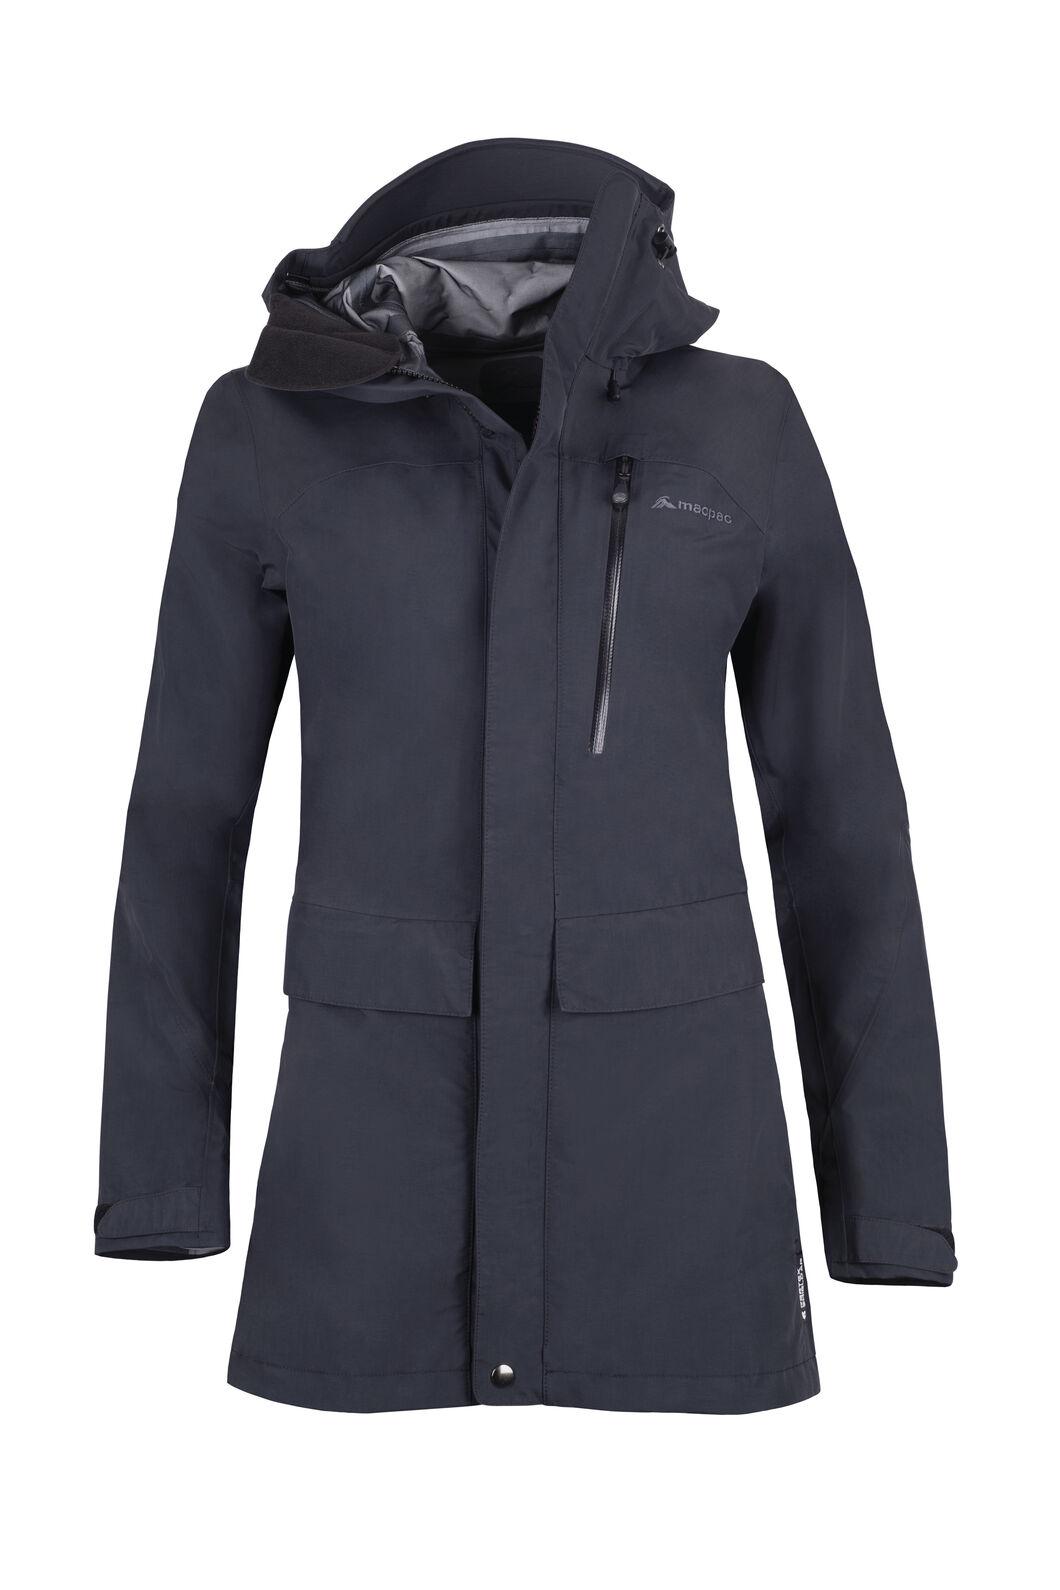 Macpac Resolution Pertex® Rain Jacket - Women's, Black, hi-res